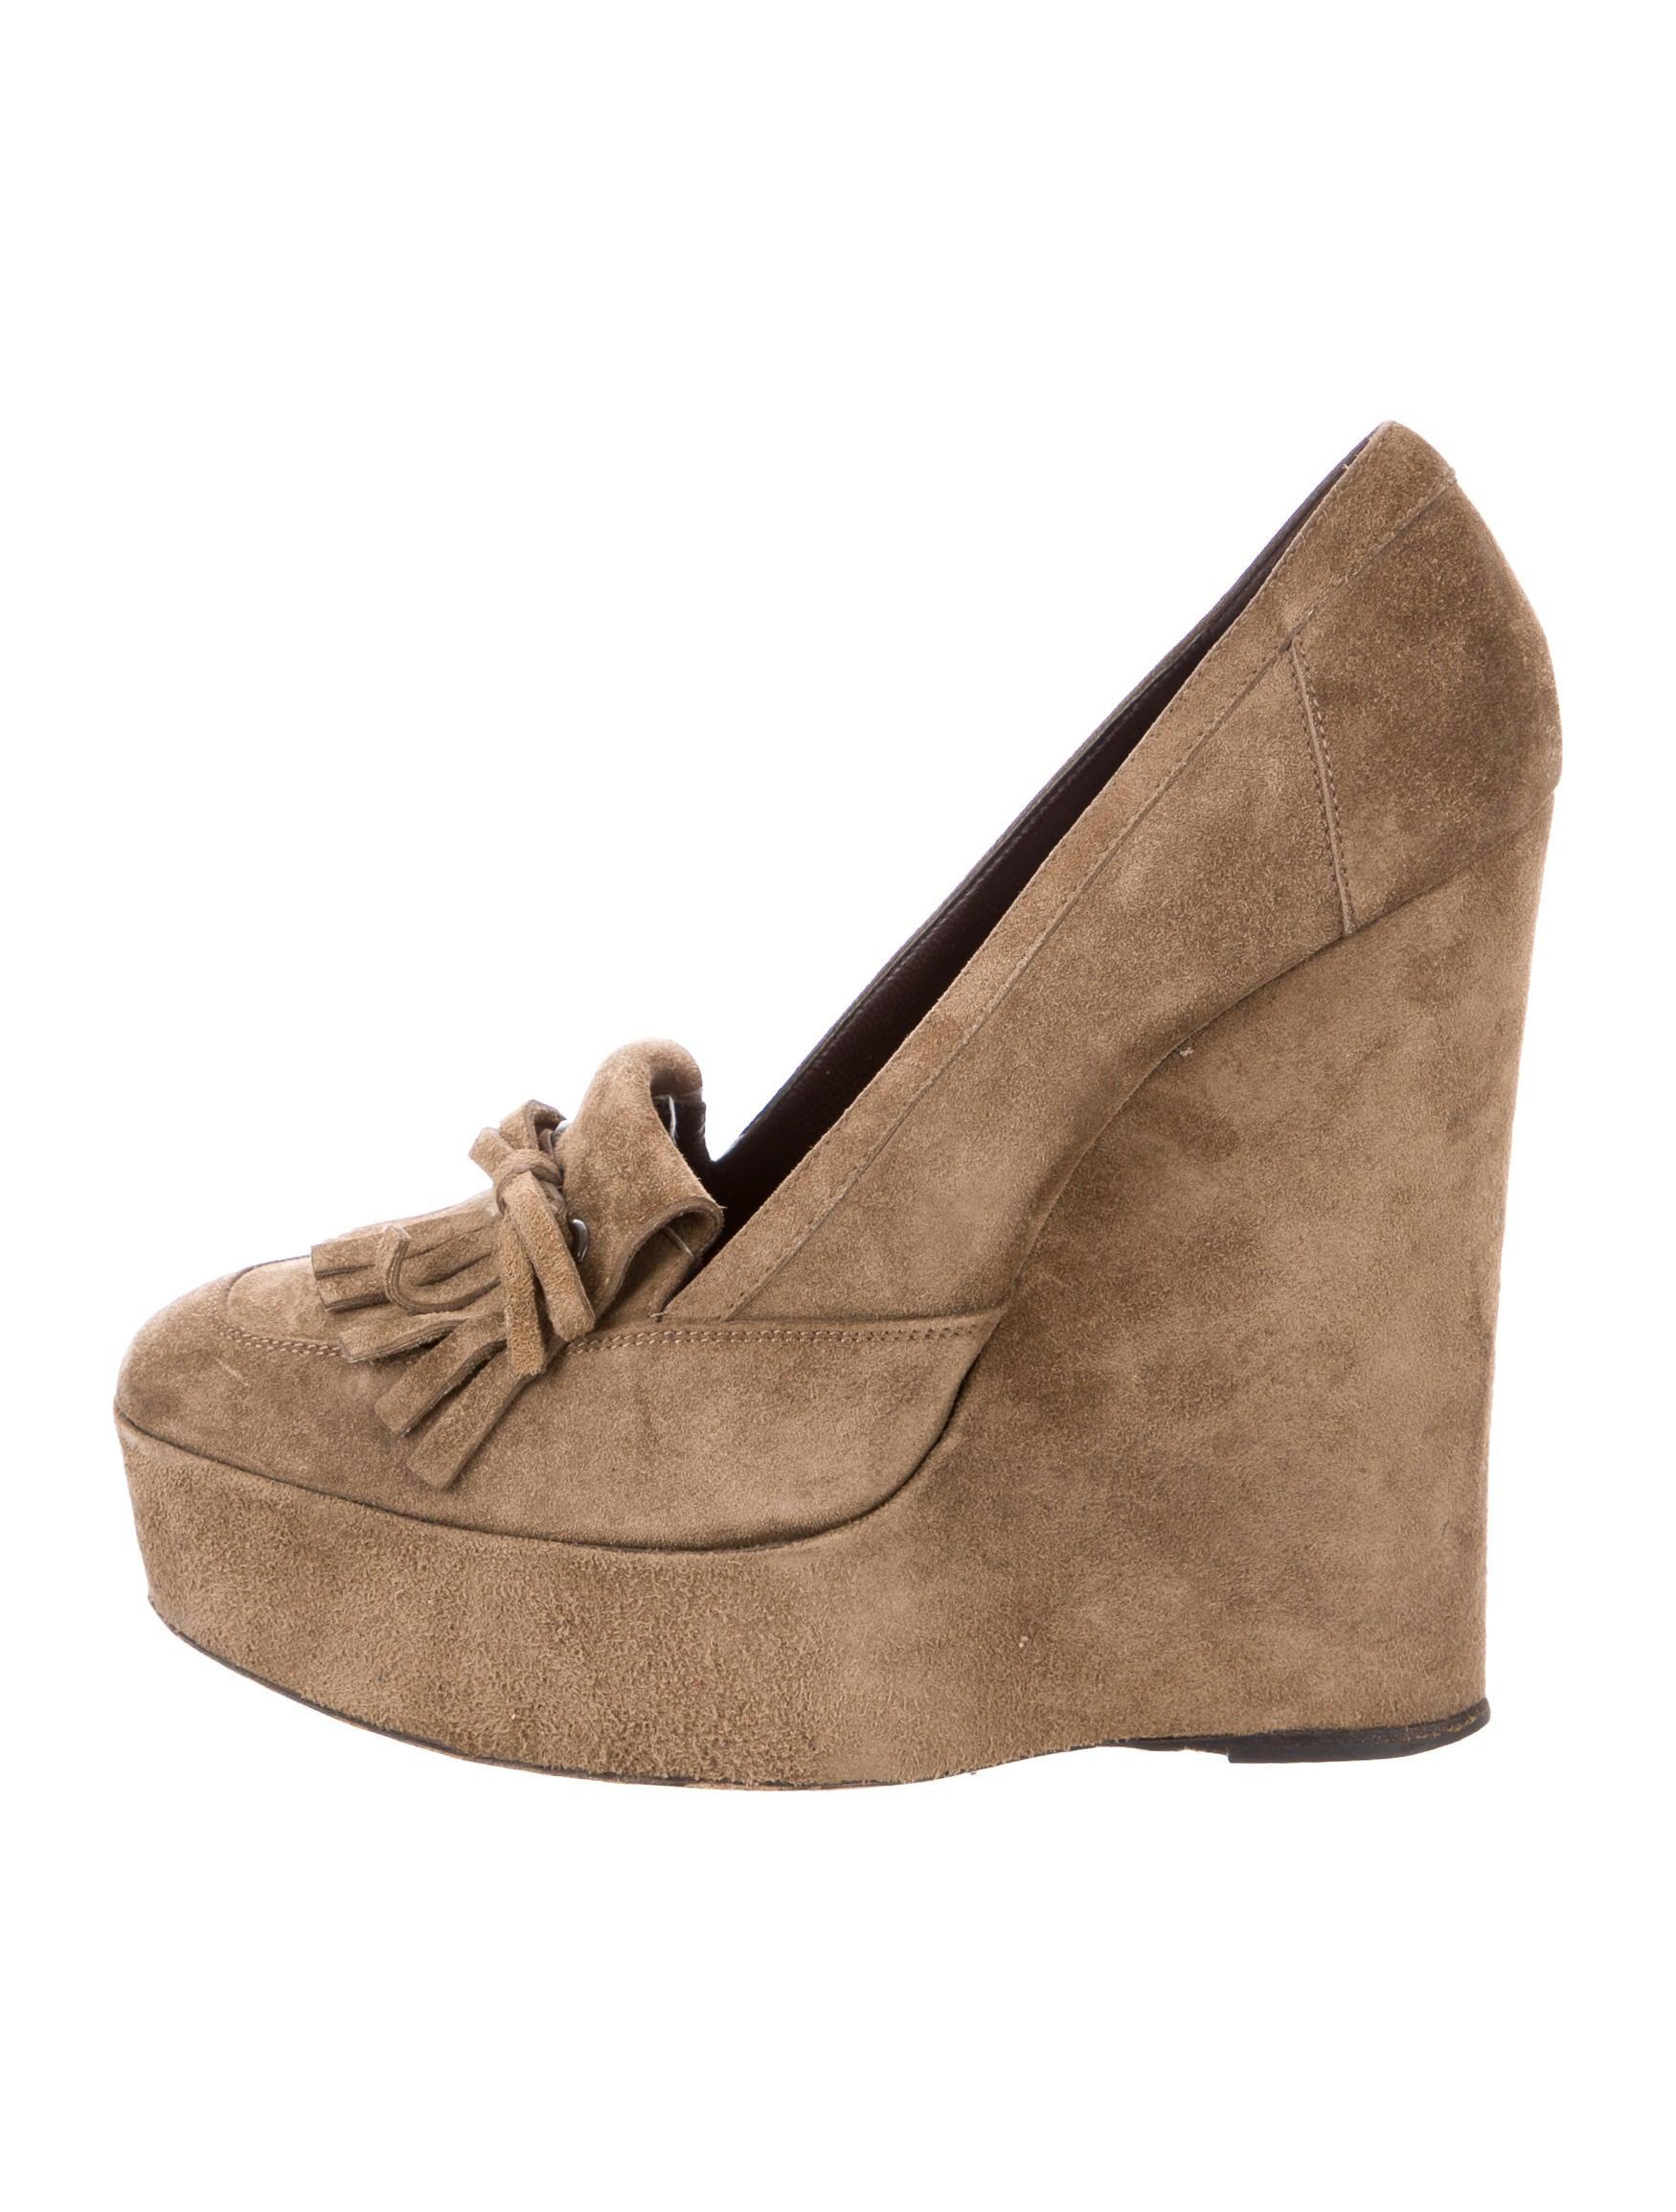 balenciaga suede platform wedges shoes bal53359 the